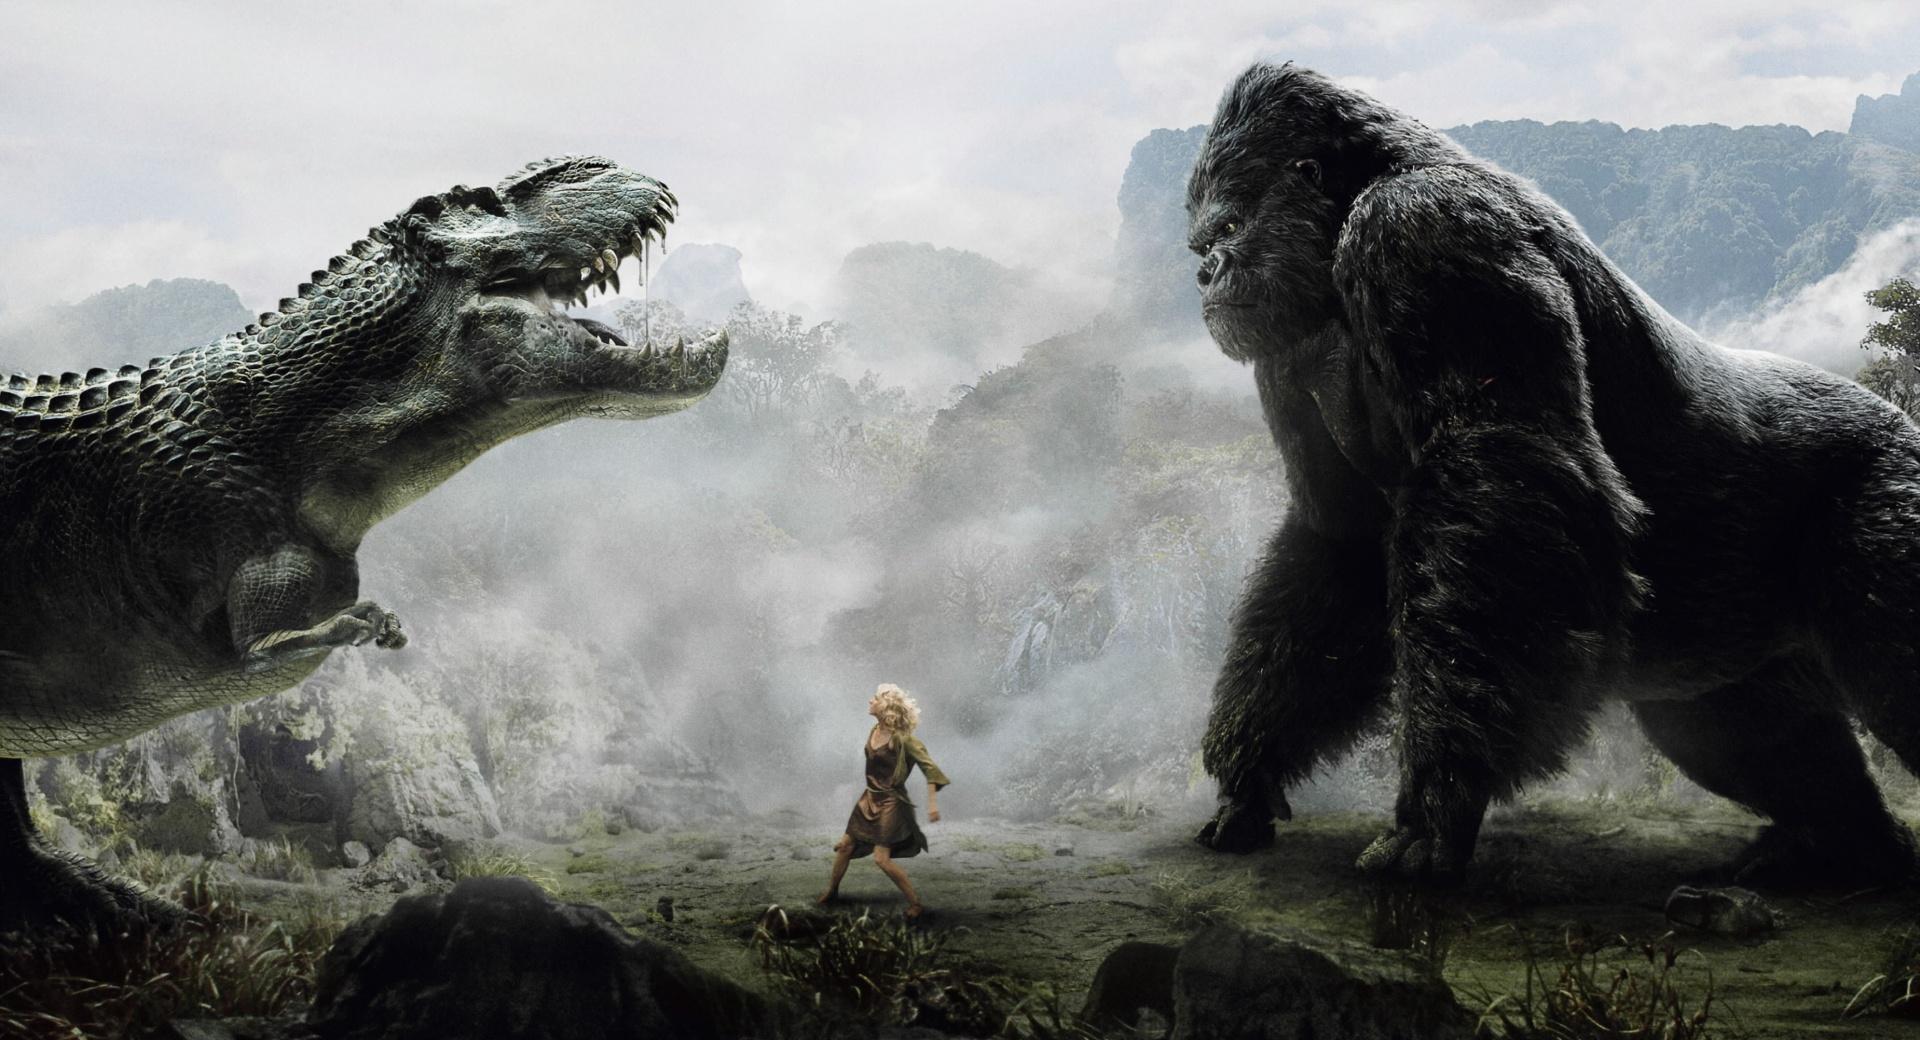 King Kong Vs Godzilla wallpapers HD quality